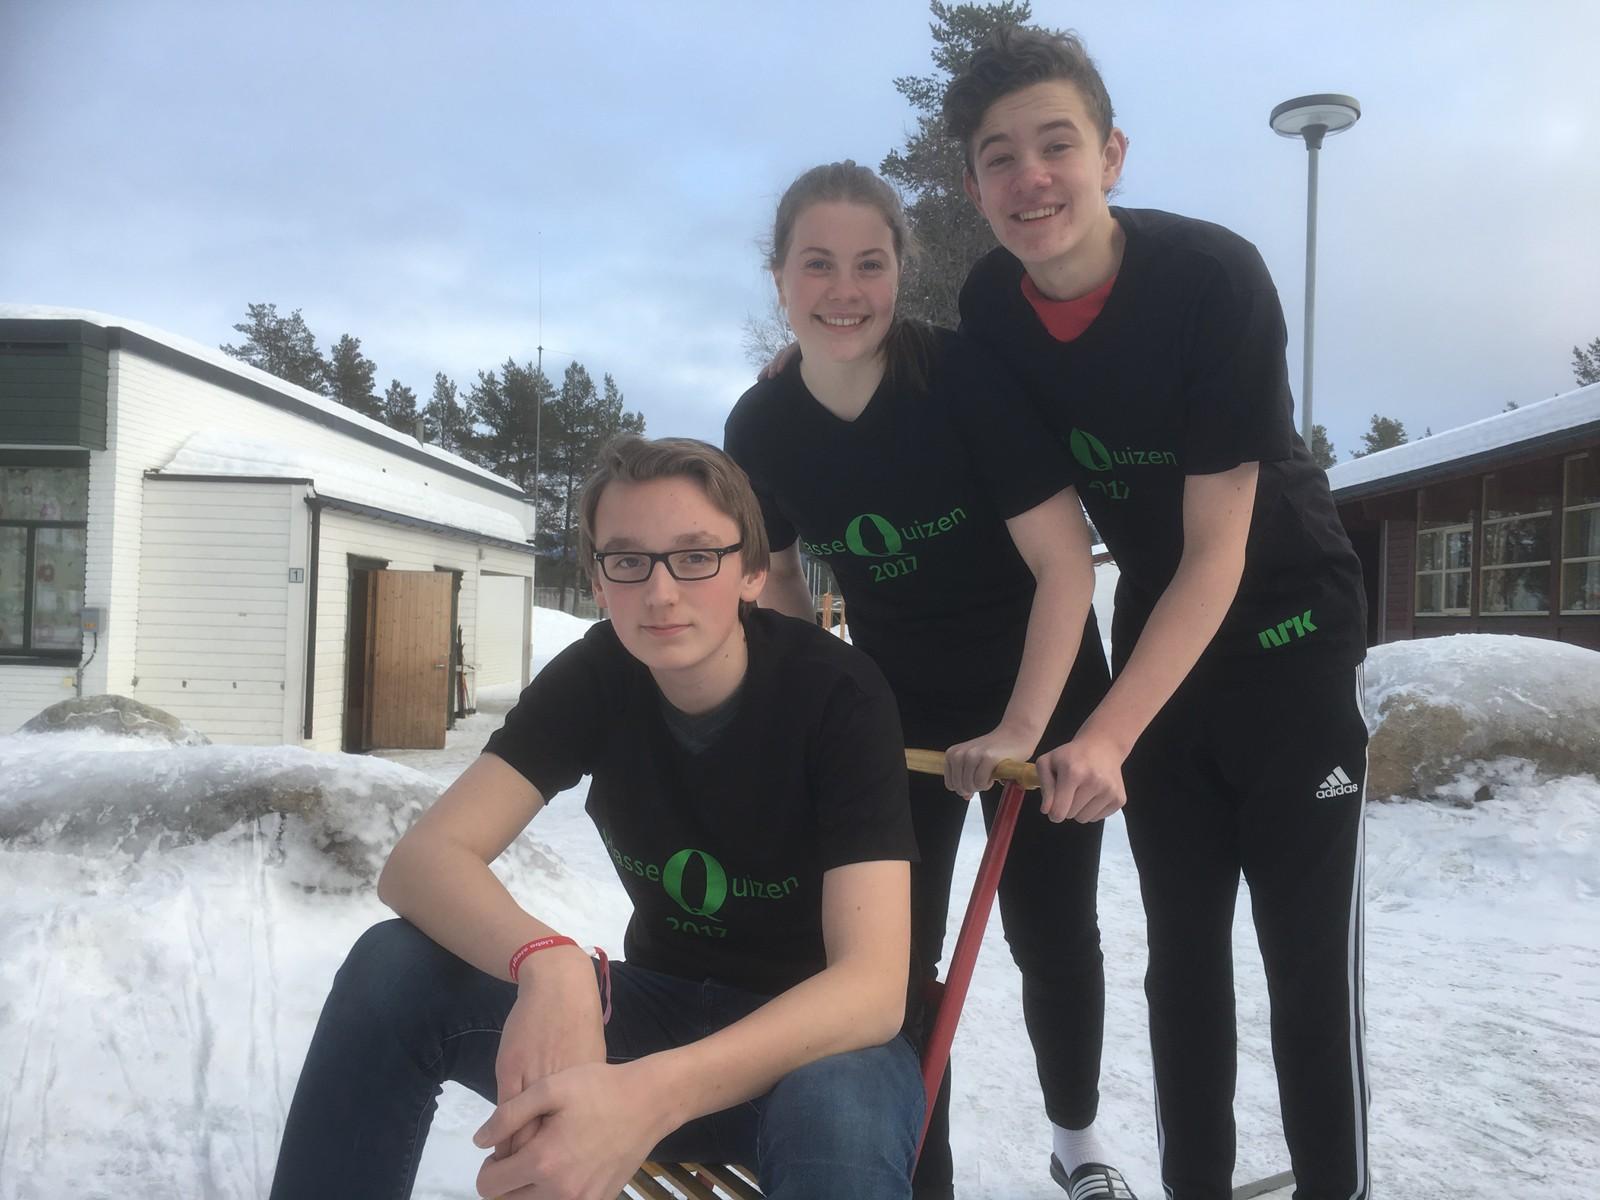 David Heidtmann, Eilen Aamo og Håkon Sundmoen fra Os skole klarte 10 rette.